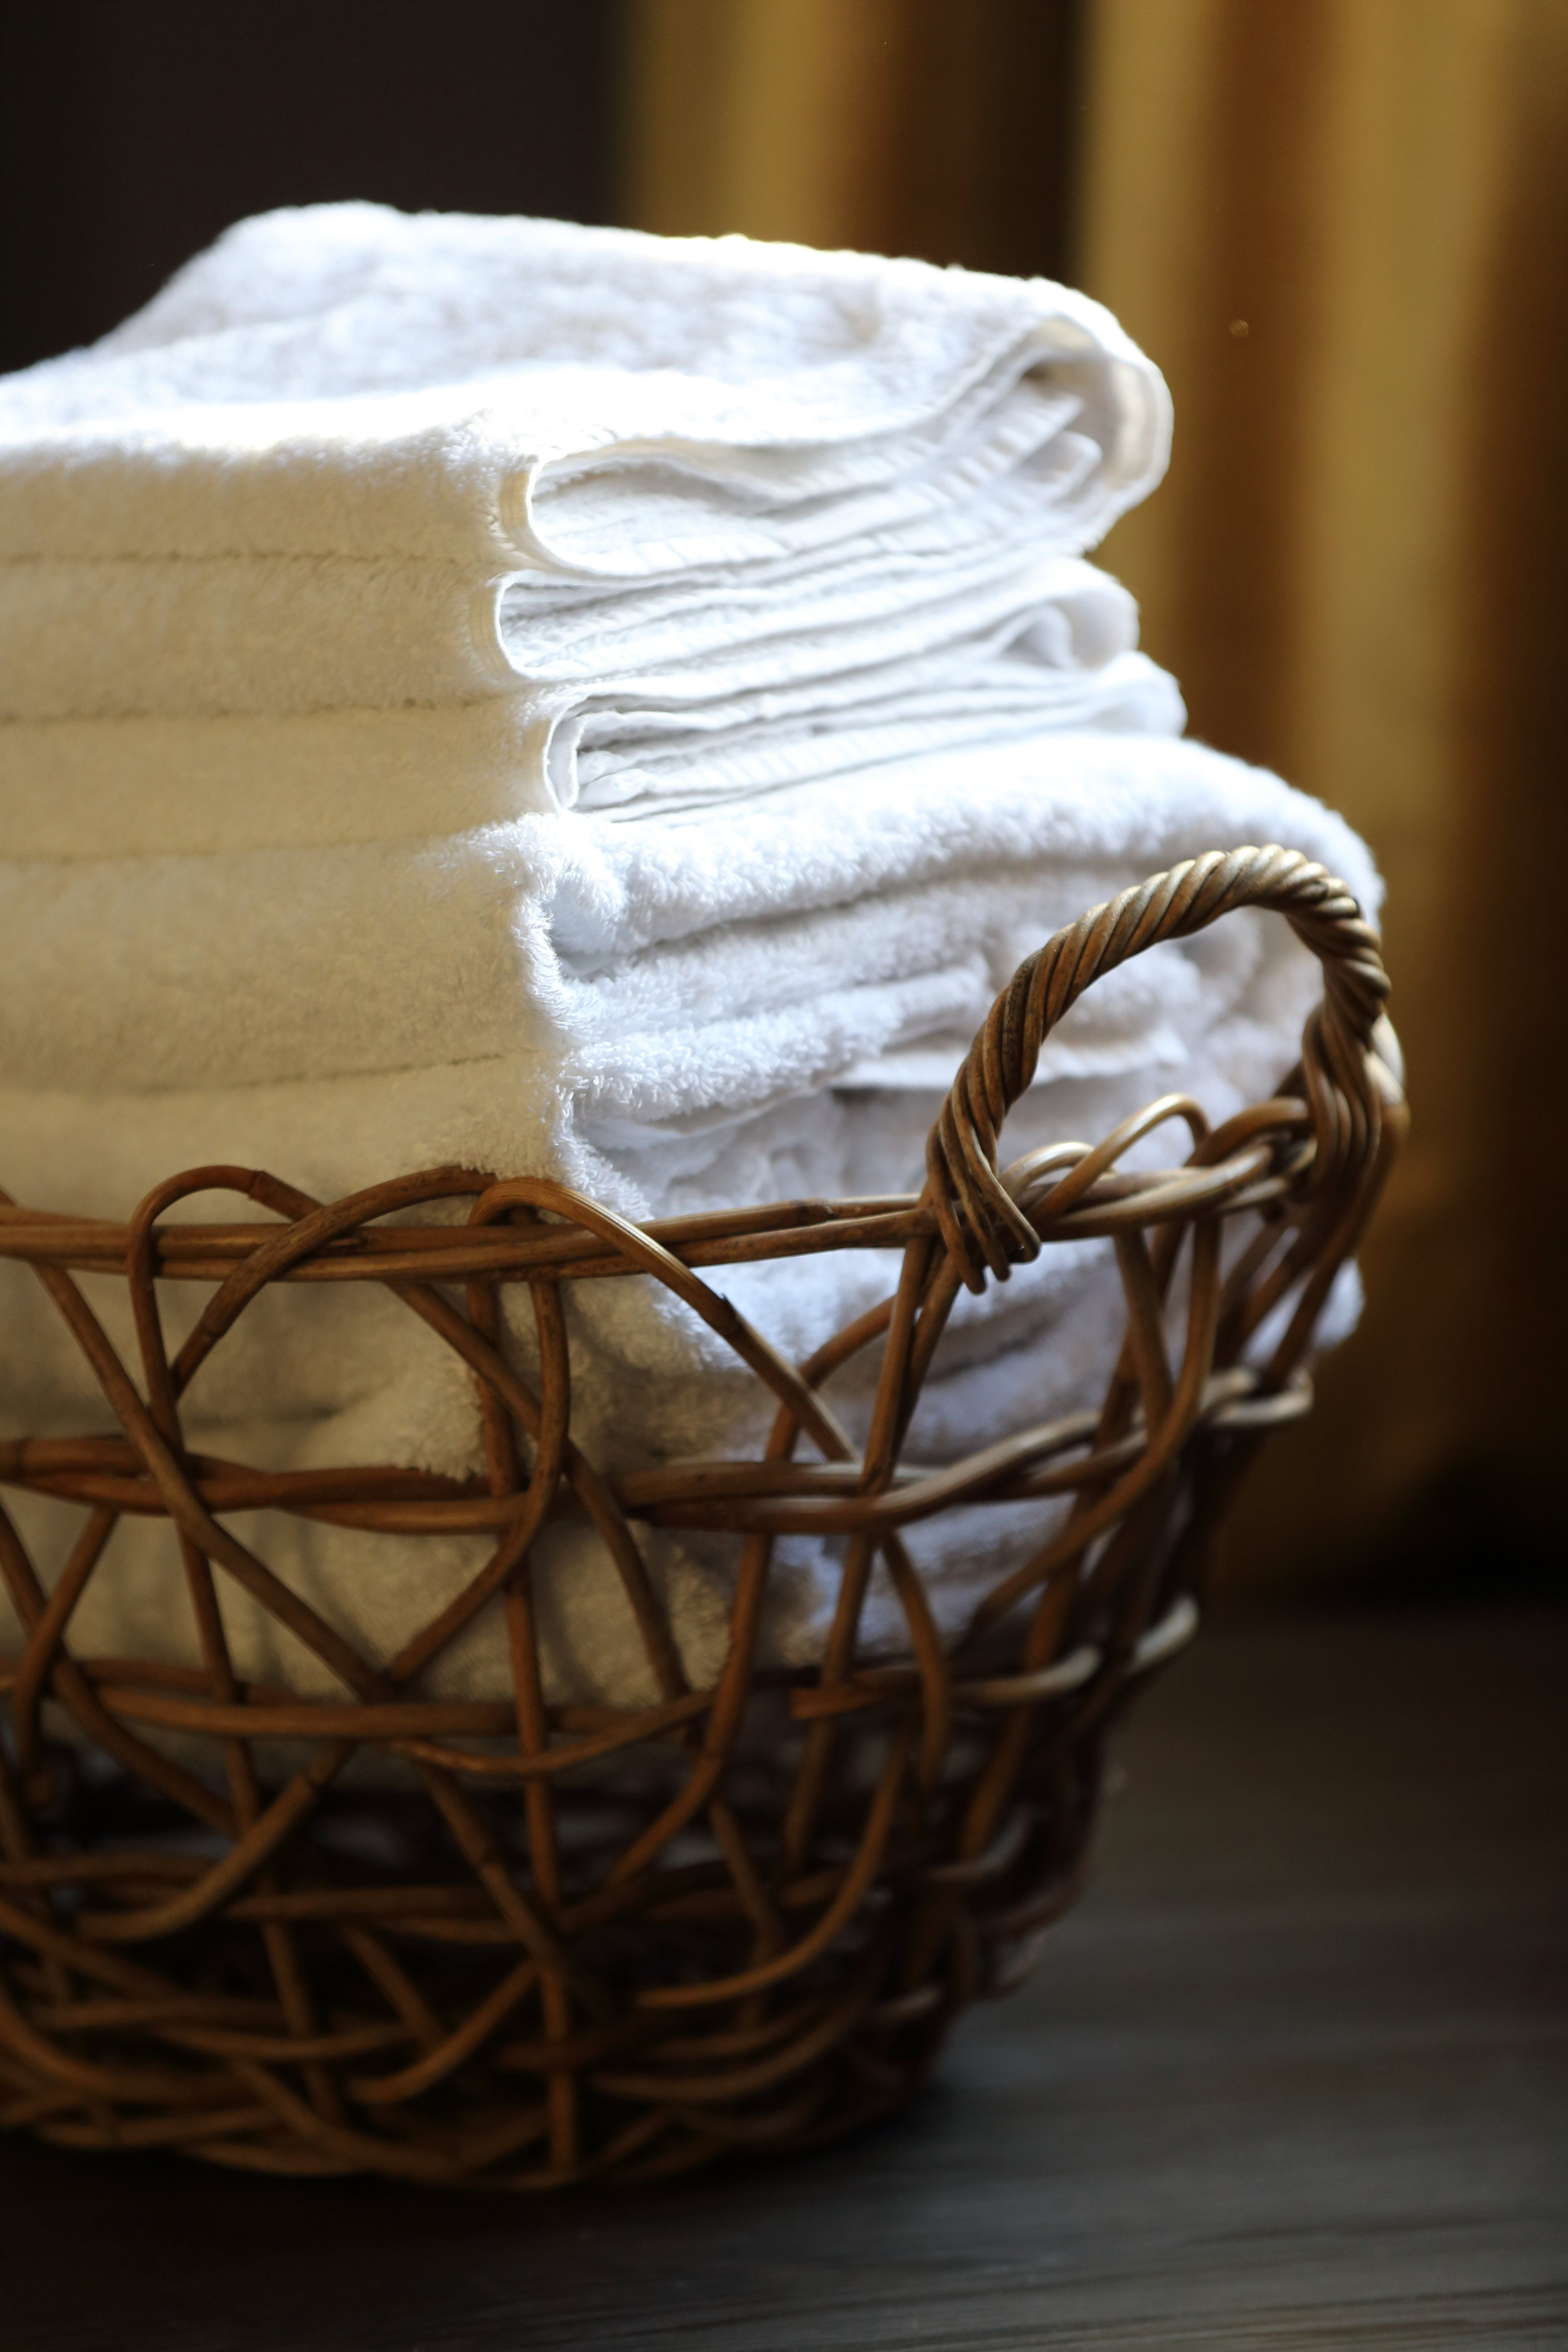 HOTEL_FRESH_WHITE_TOWELS_BASKET_CLOSEUP_PORTRAIT.jpg